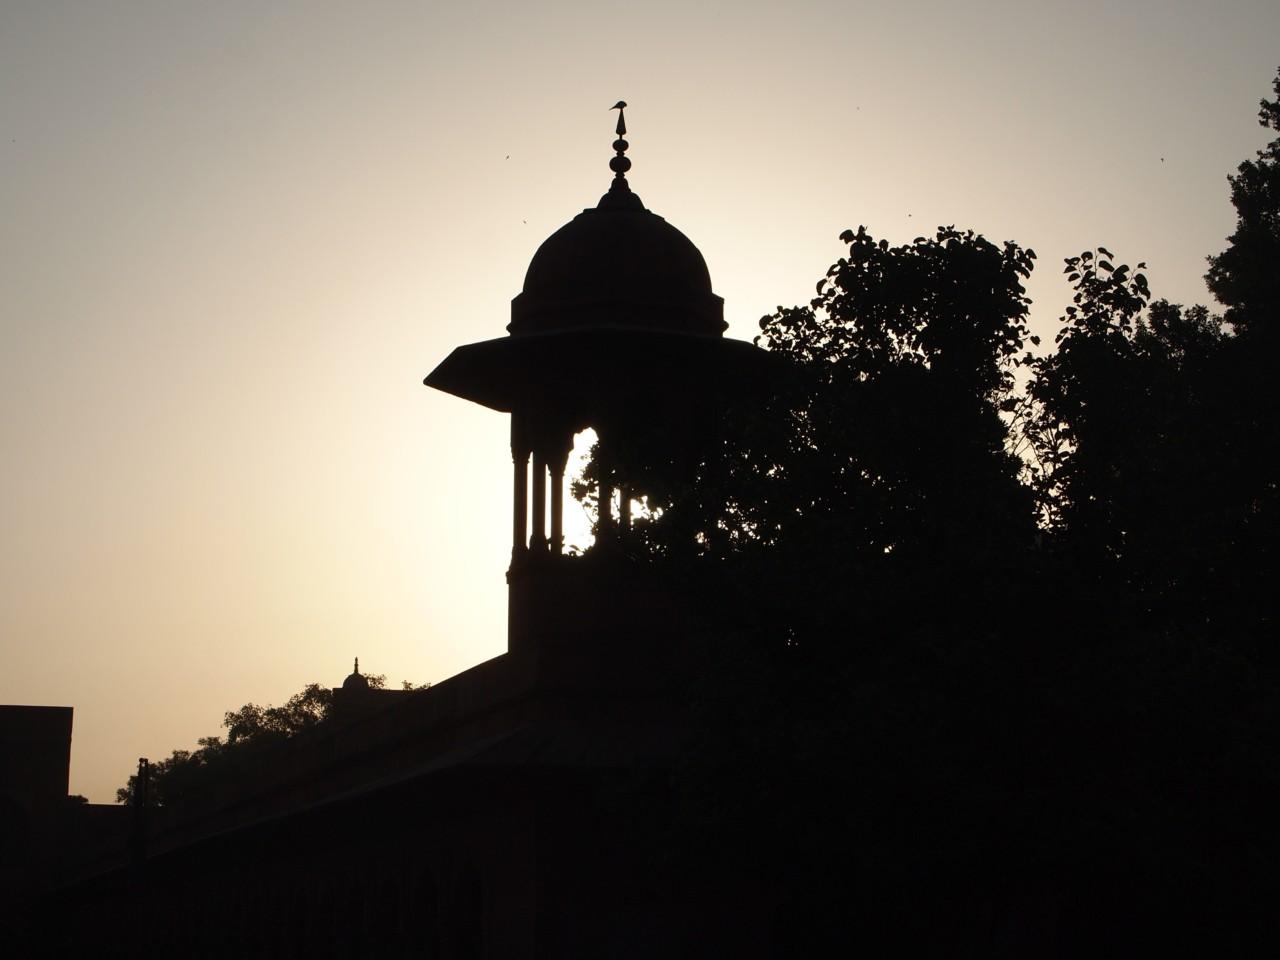 Sonnenaufgang im Vorgarten des Taj Mahal